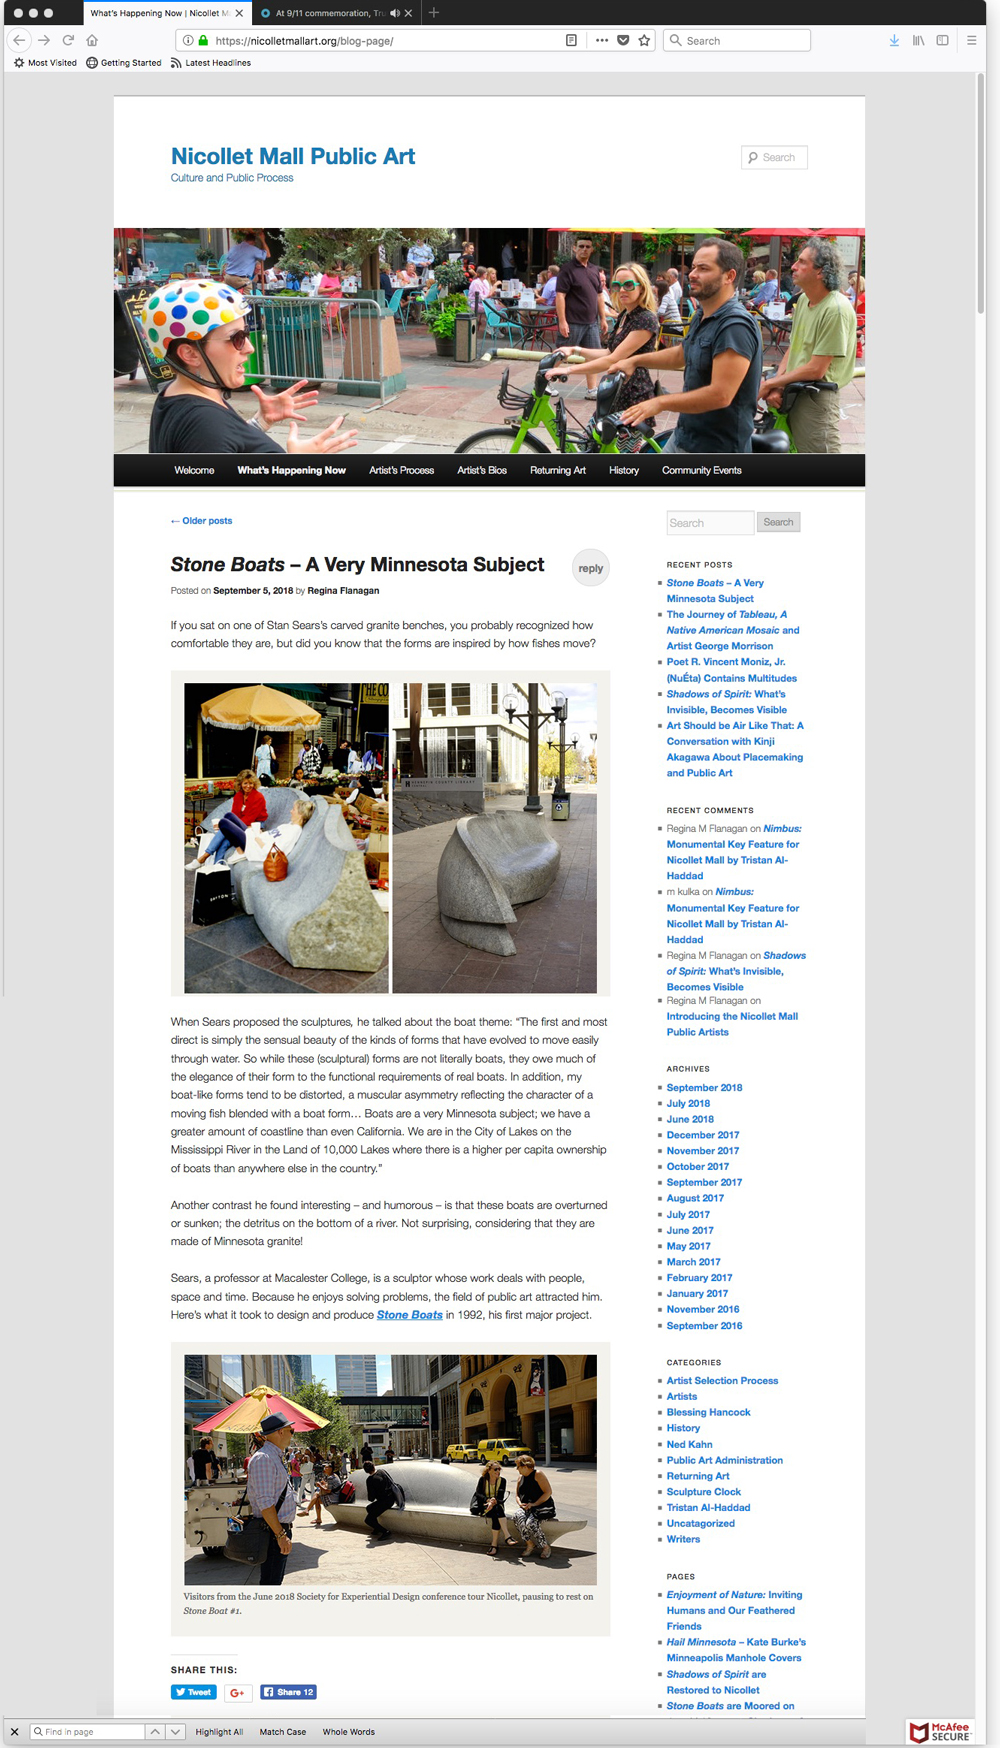 Nicolletmallart.org Blog page